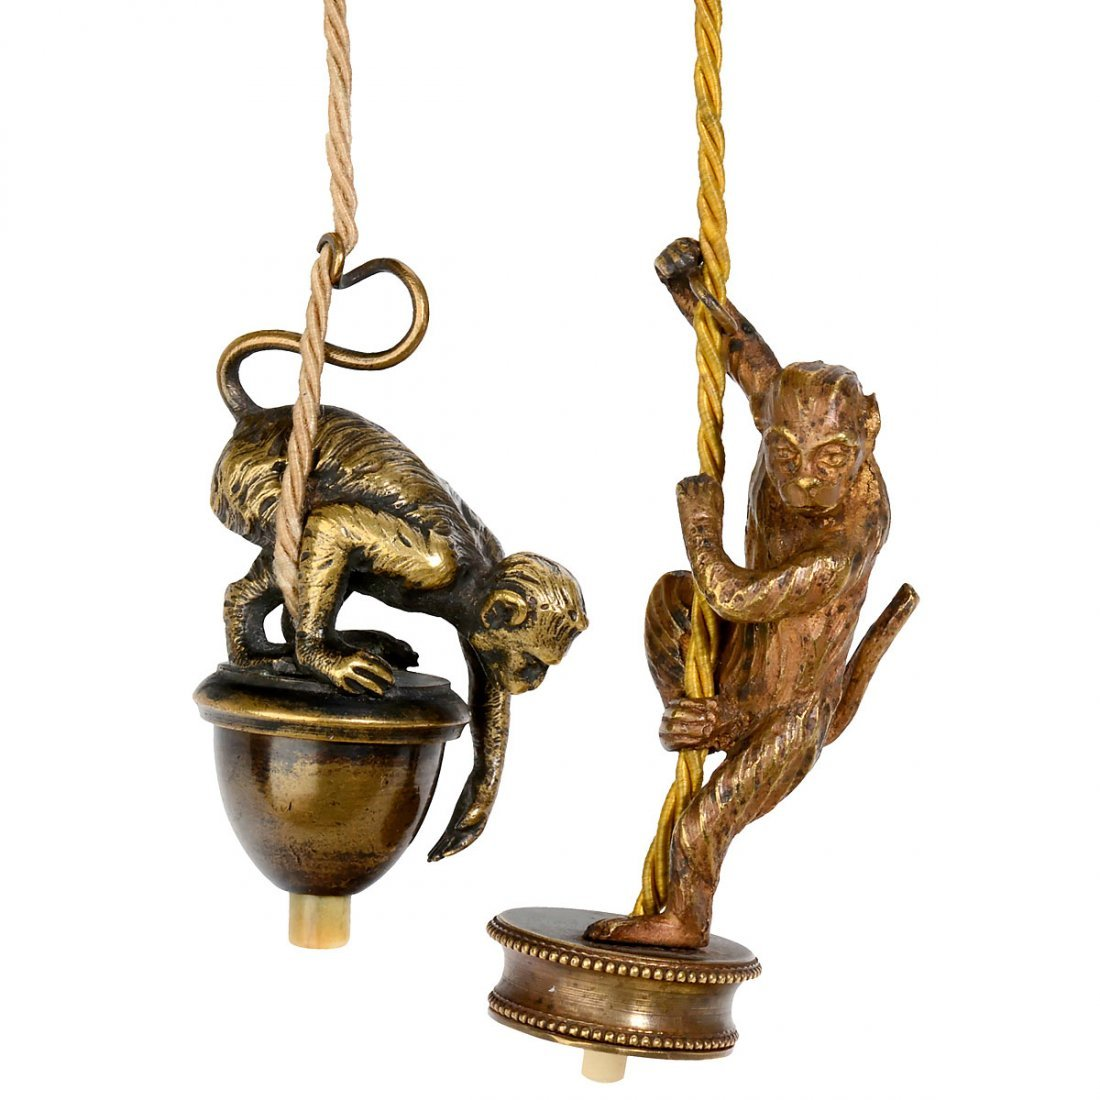 5 Electrical Table Bells Depicting Monkeys, c. 1910 - 4